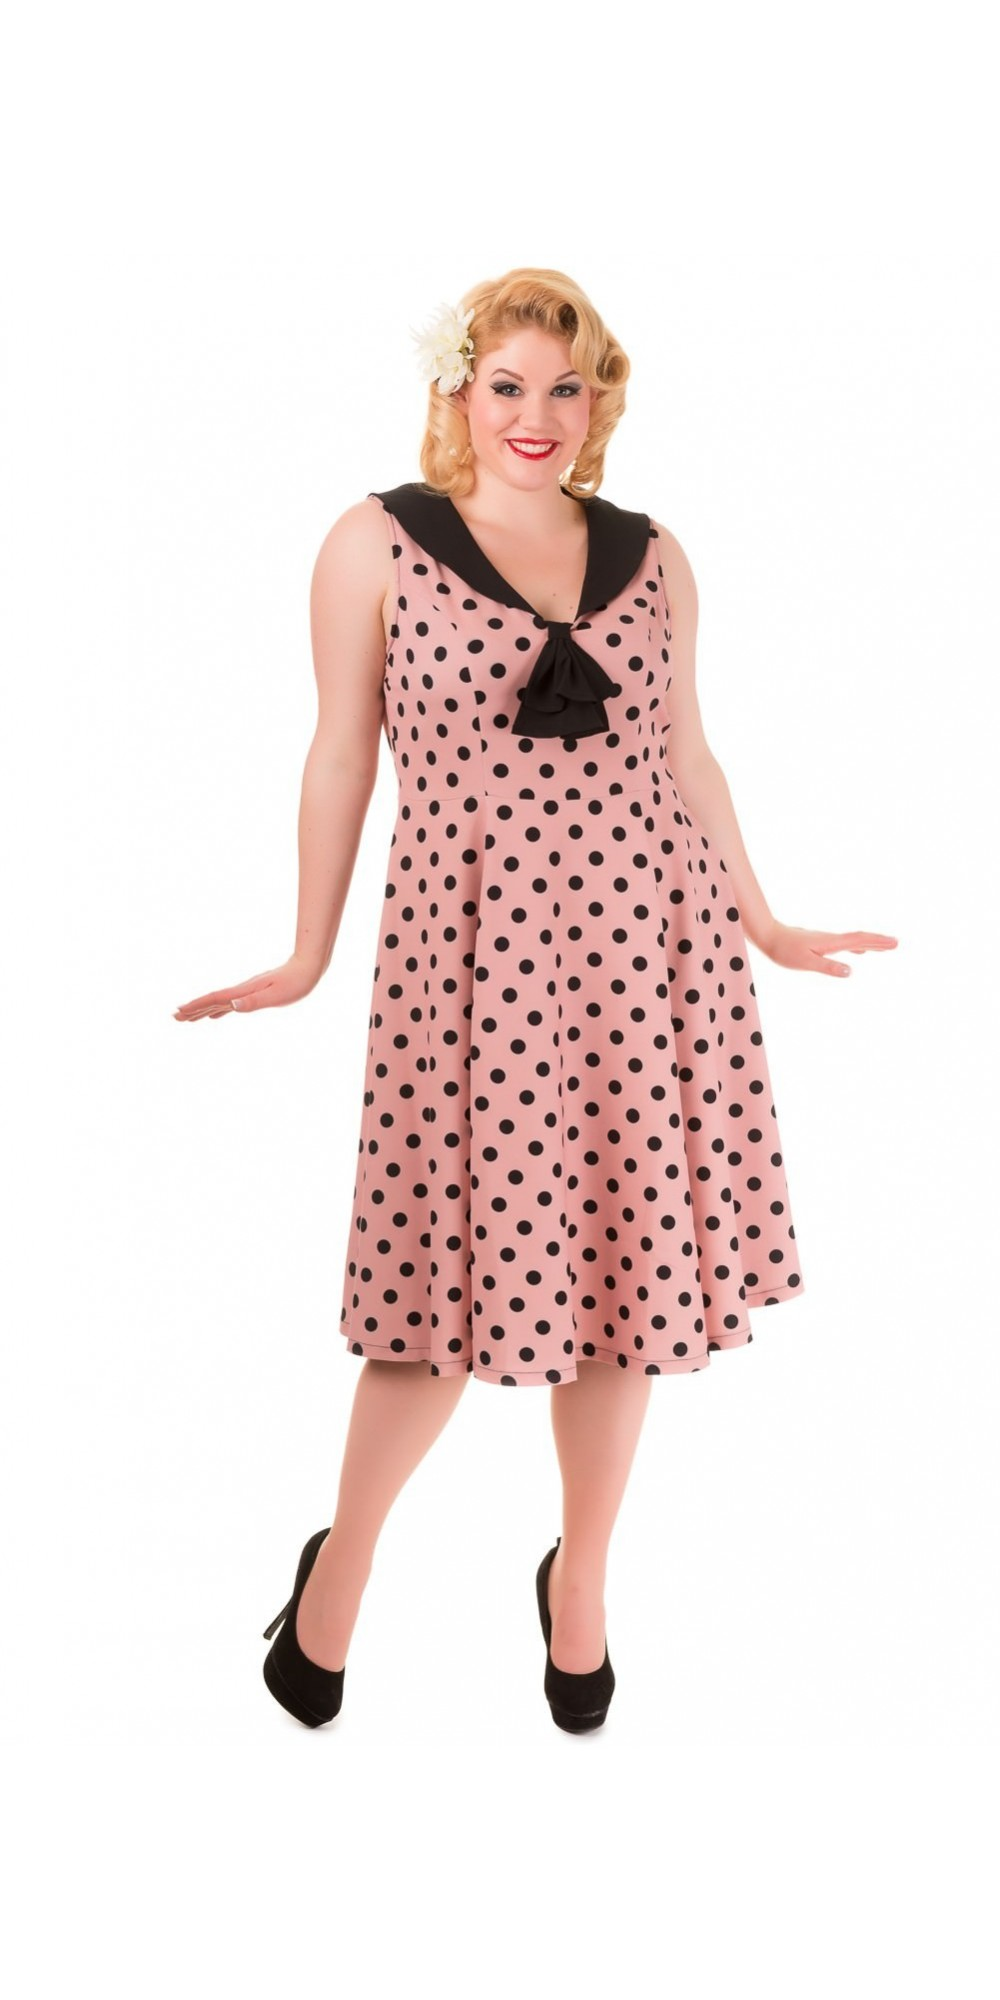 Pin Up Vintage Style Polka Dot Short Sleeve Party Dress